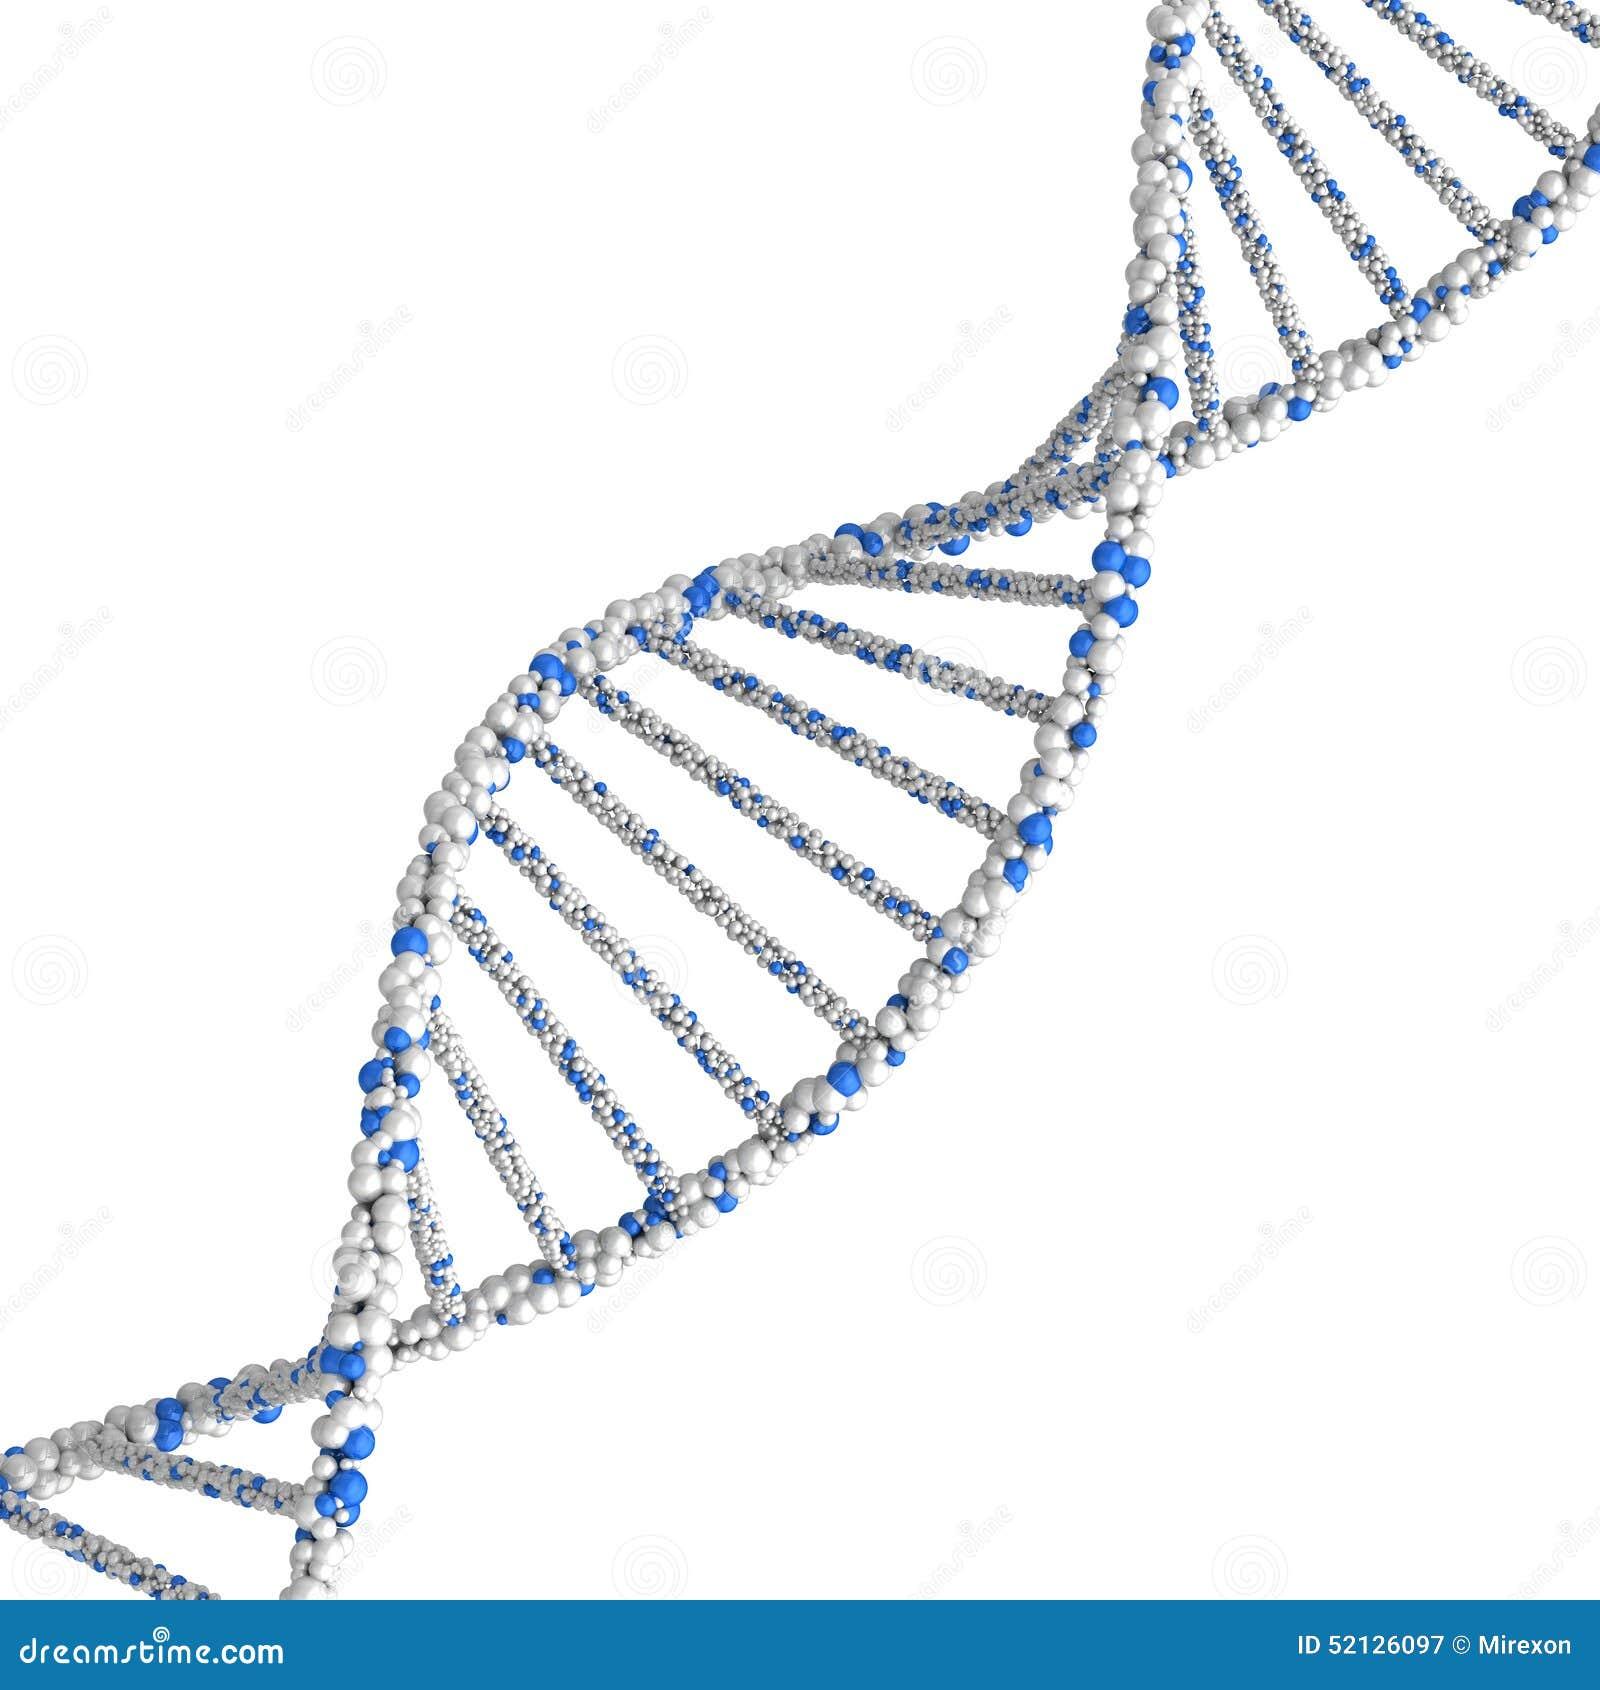 Dna Model Wallpaper: DNA Molecule. 3d Render On A White Background Stock